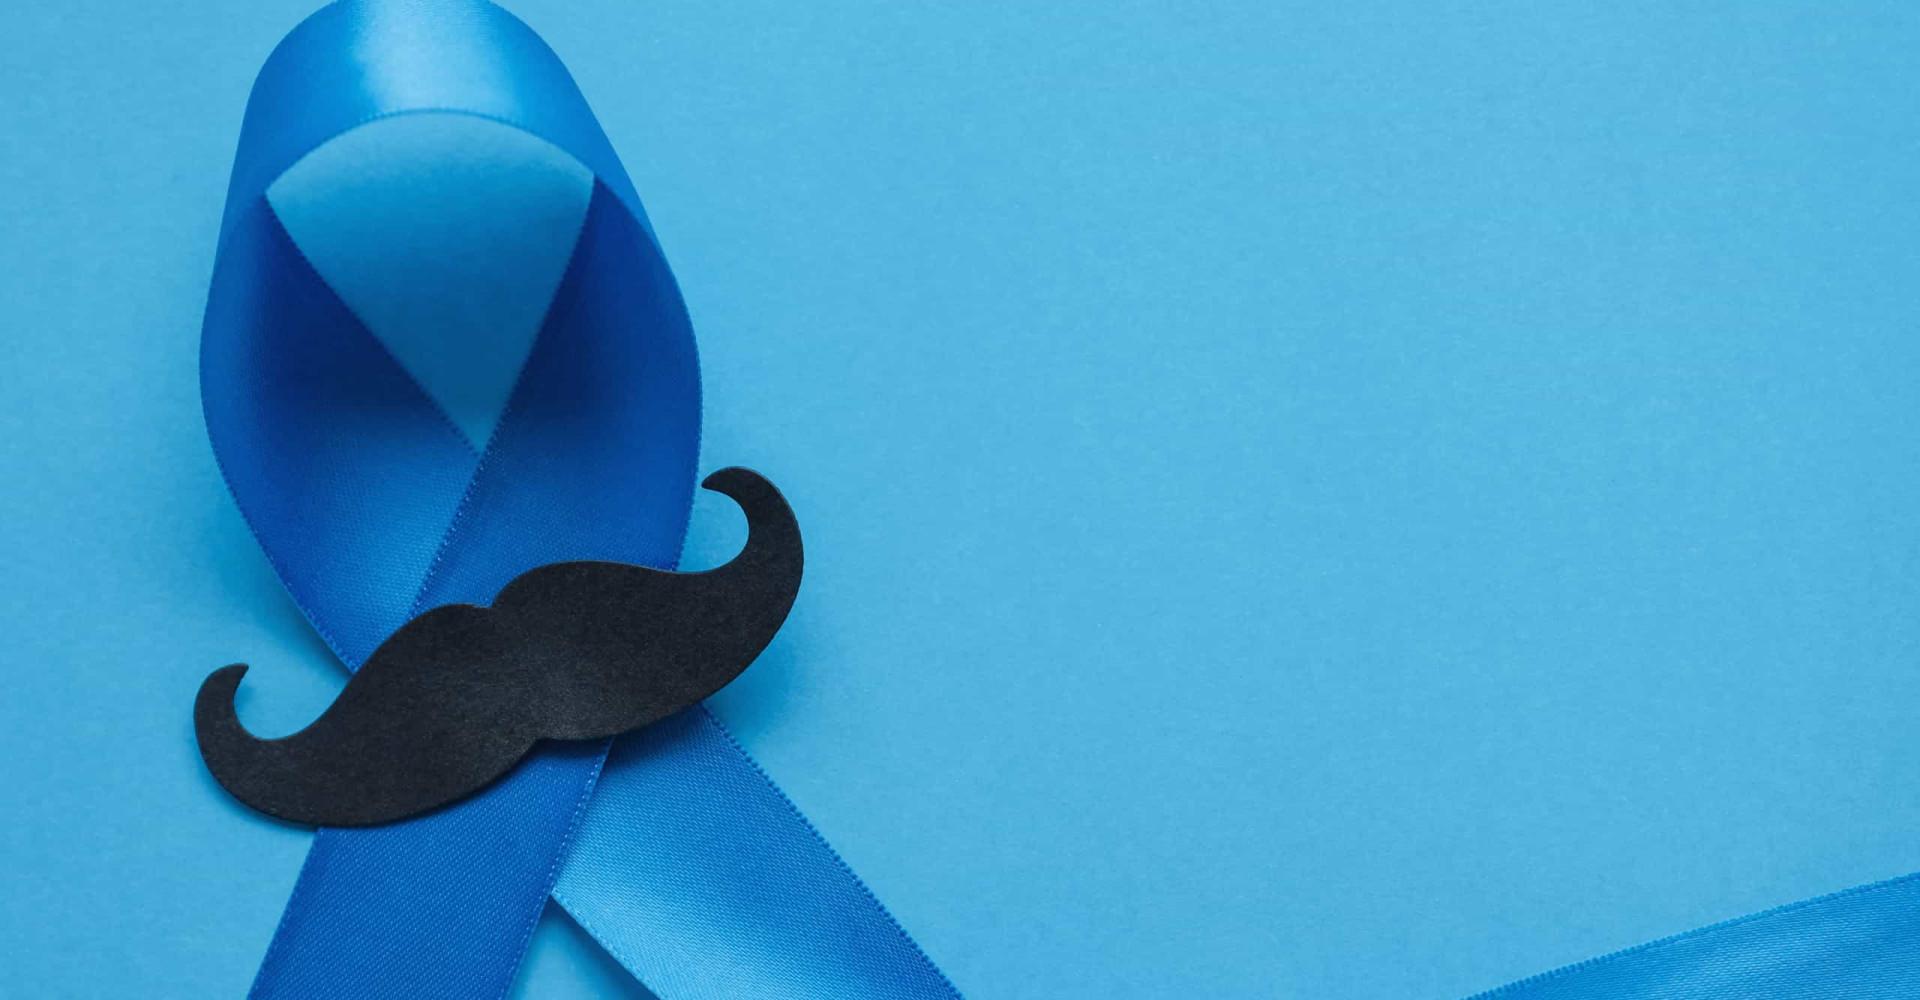 Movember: The biggest health risks for men